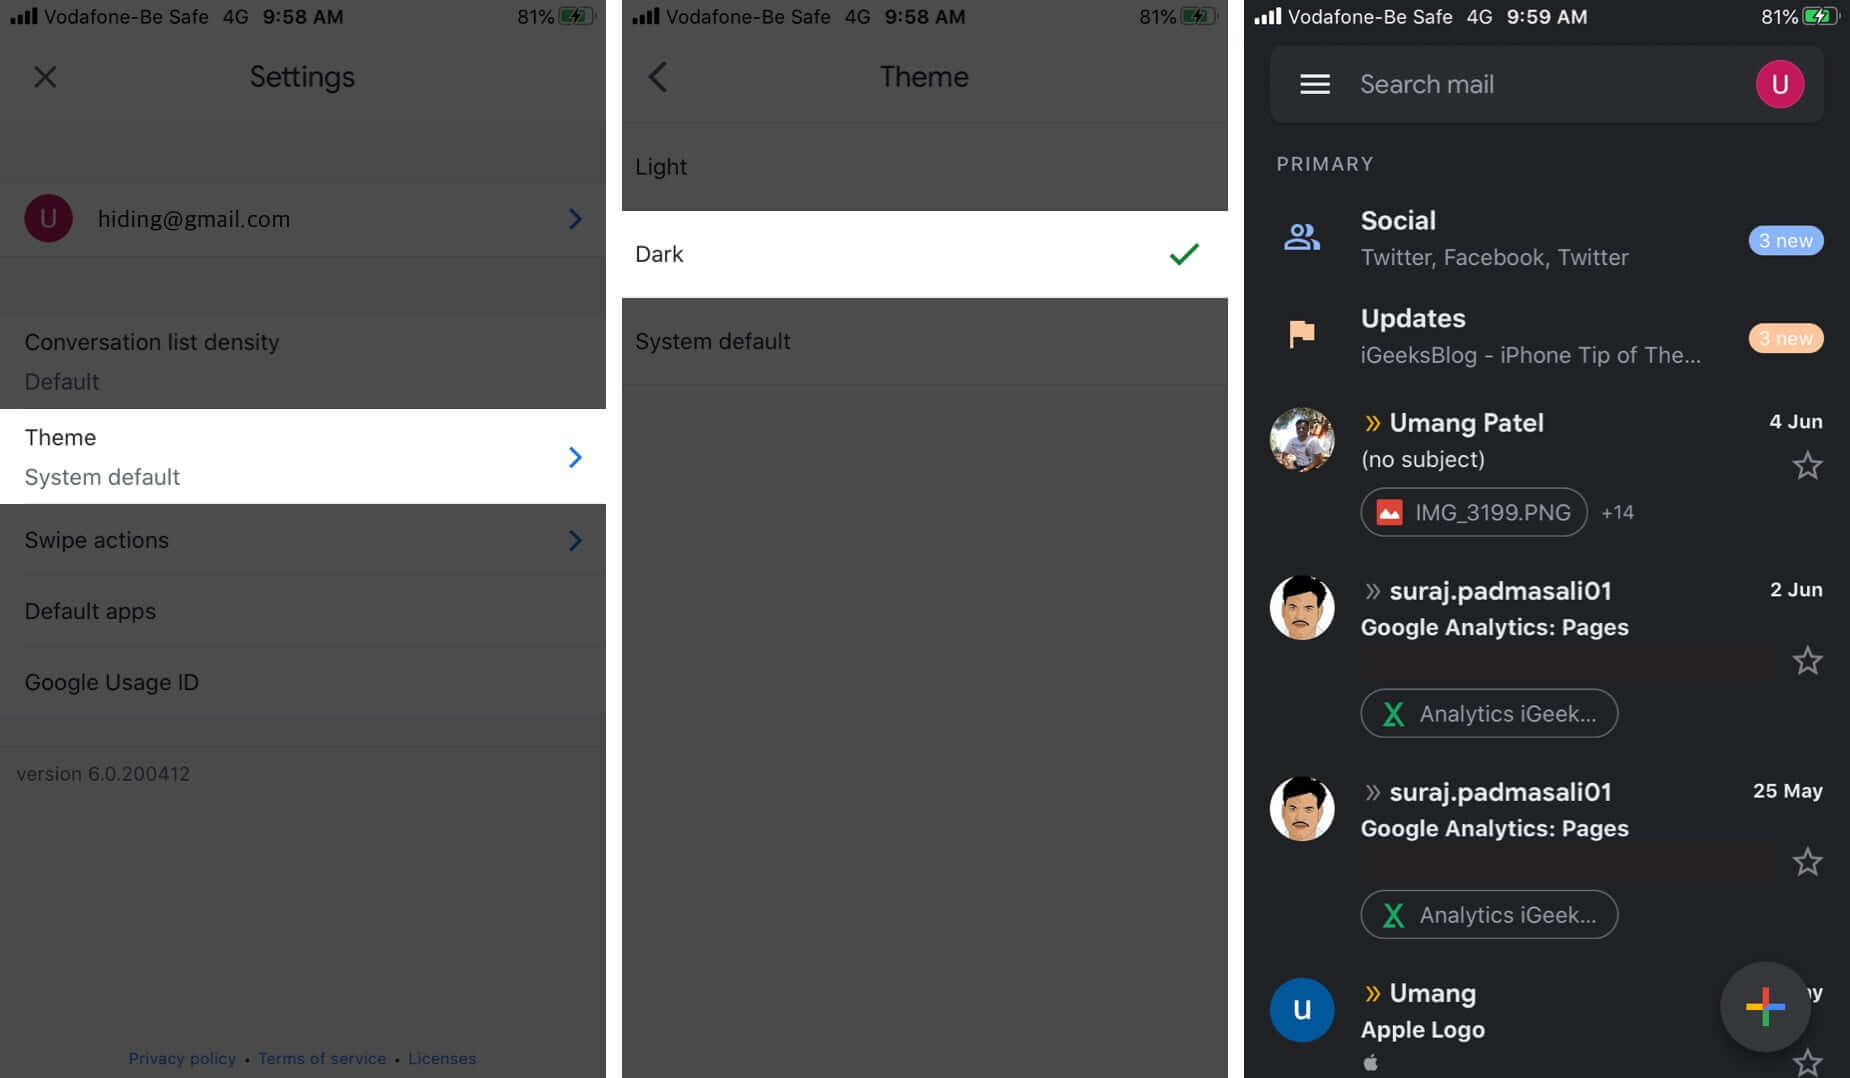 Turn ON Gmail Dark Mode on iPhone